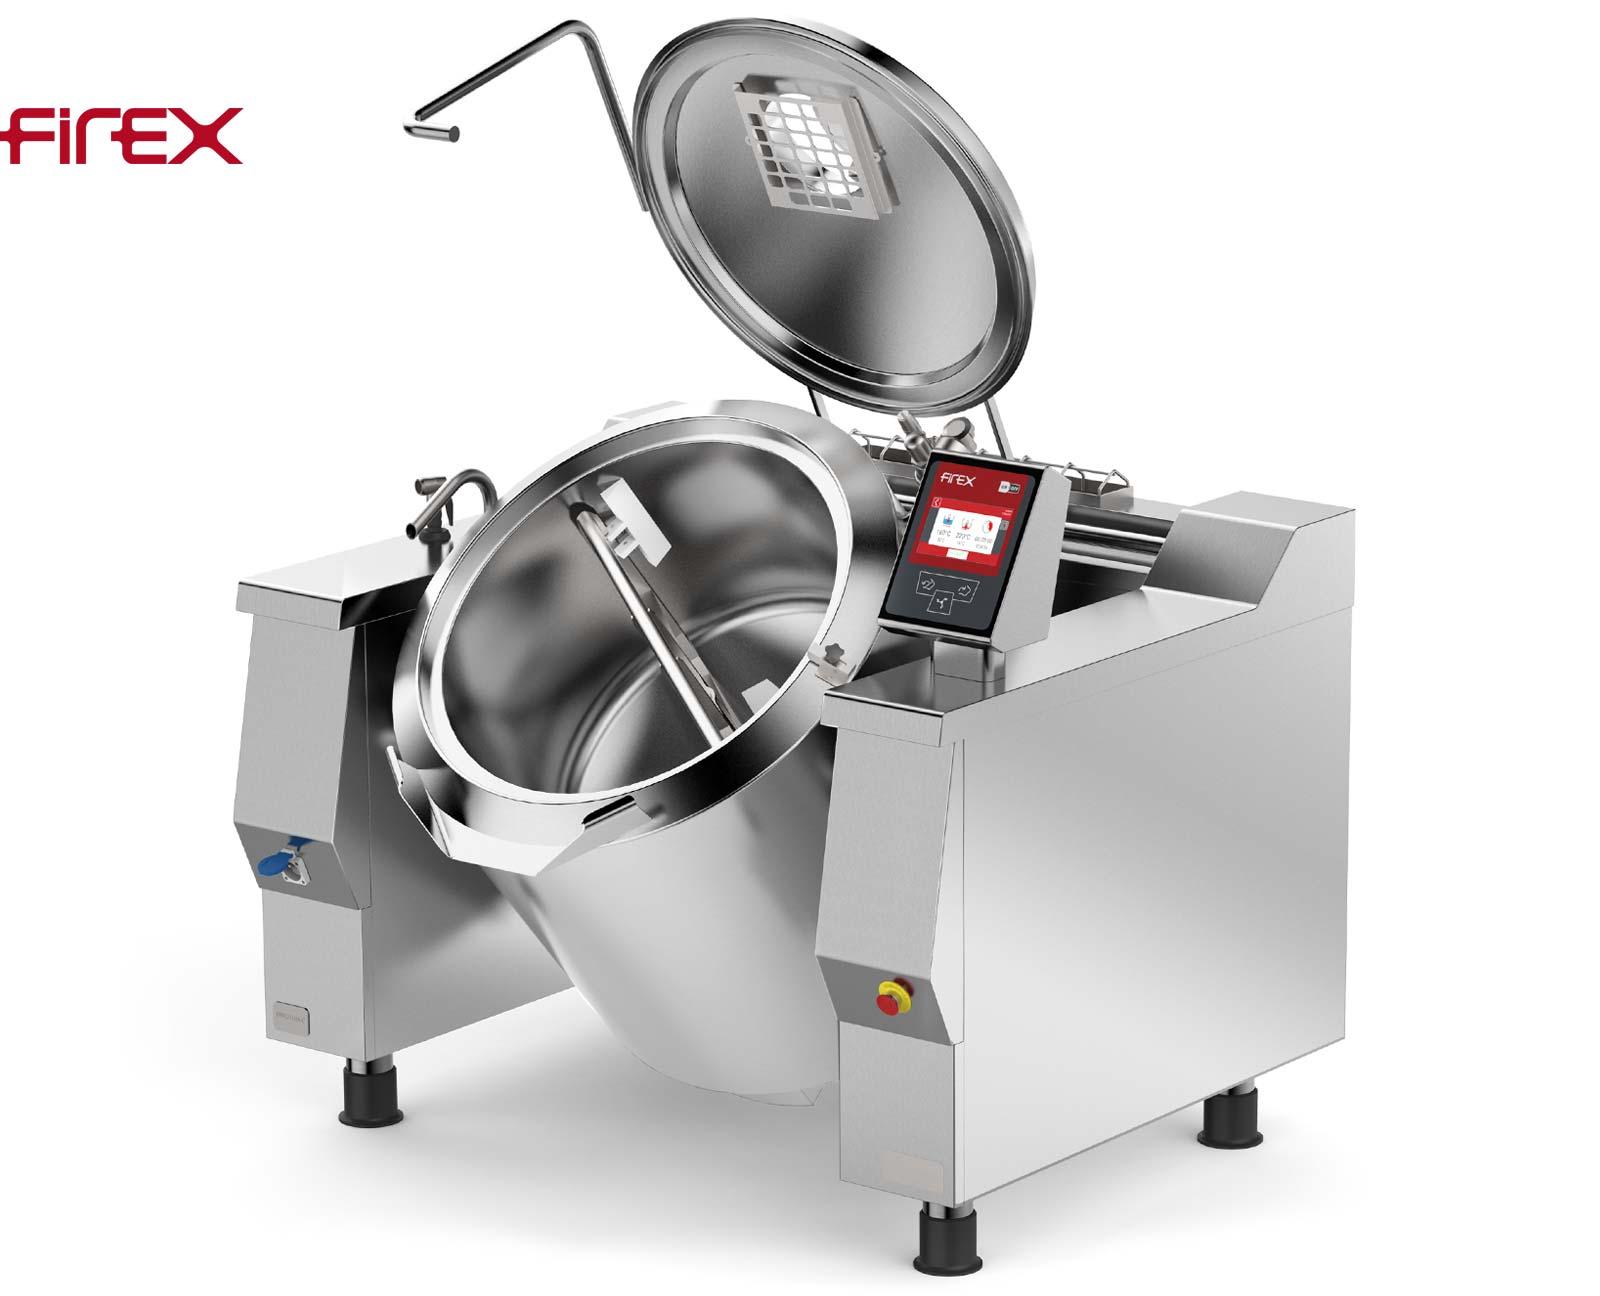 Firex Baskett Kipp-Kochkessel mit Rührwerk PRIG130_V1